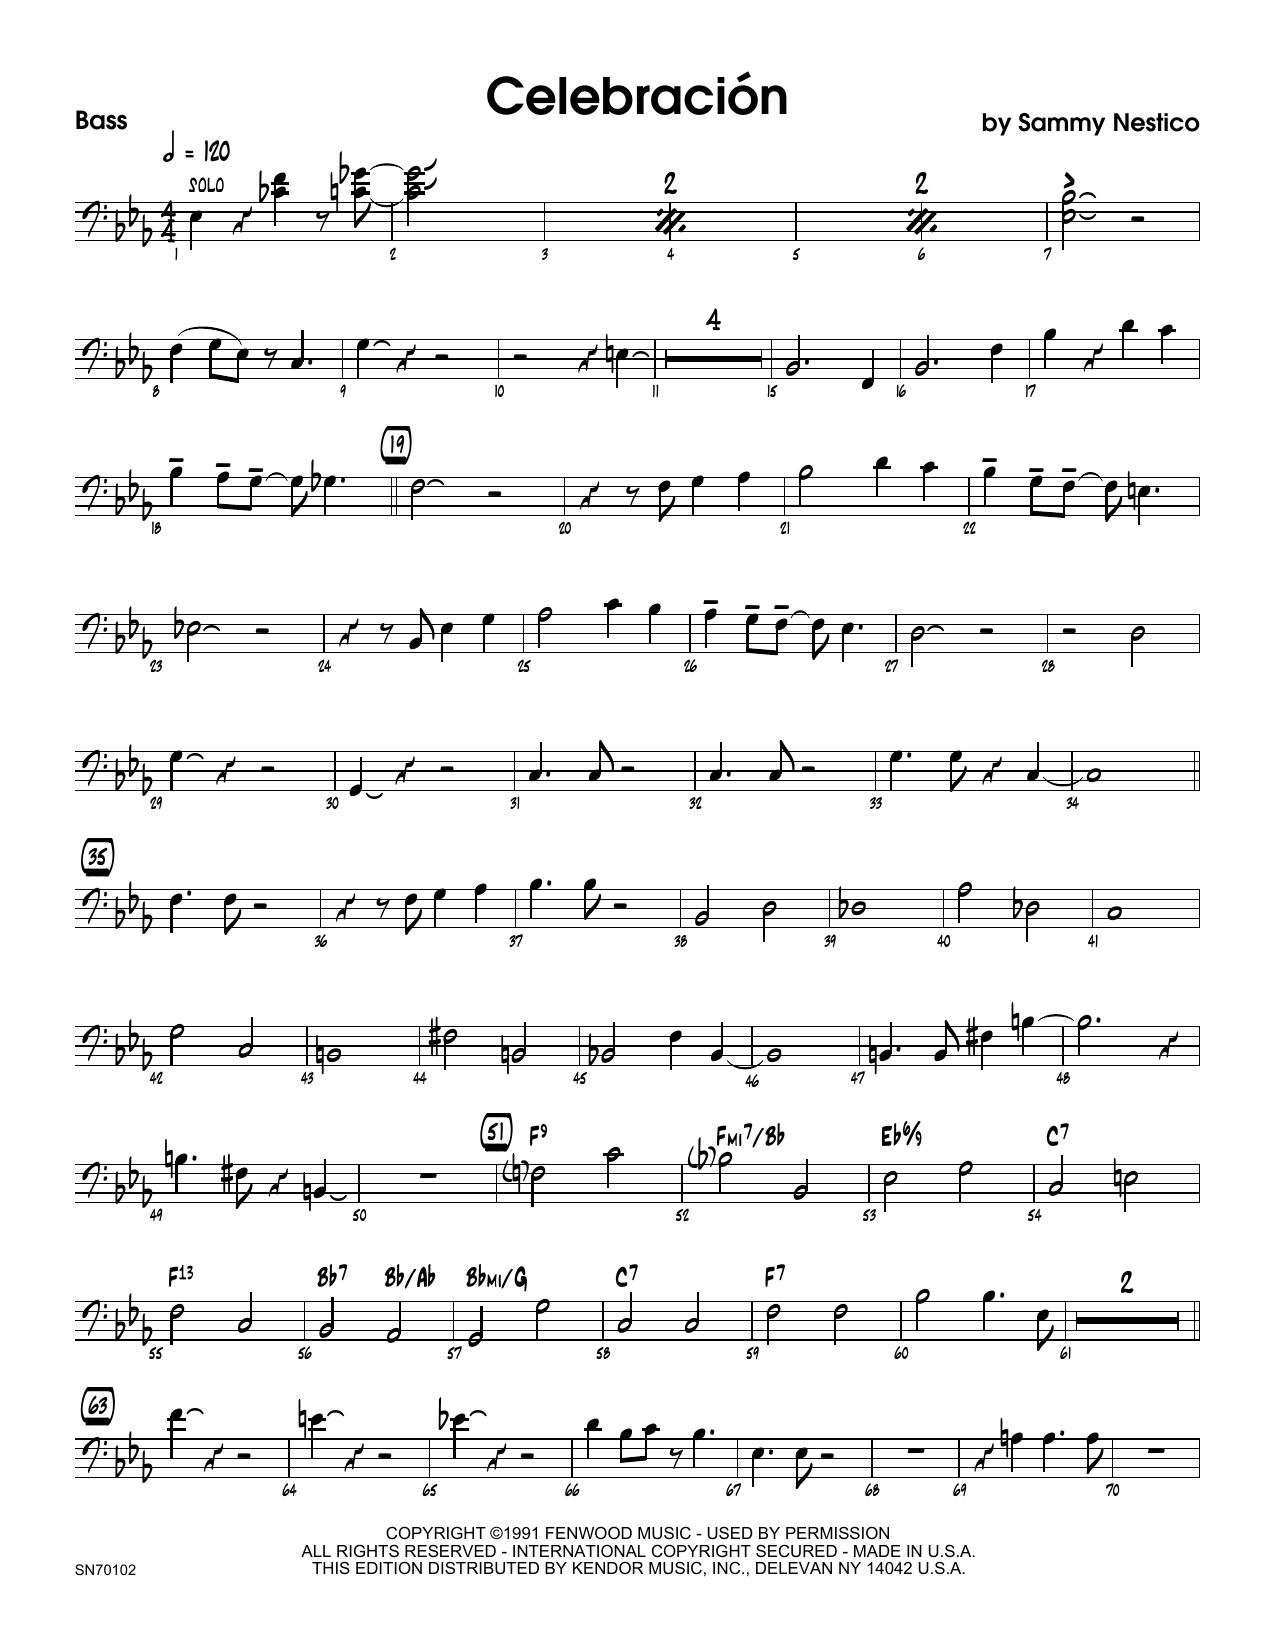 Celebracion - Bass Sheet Music